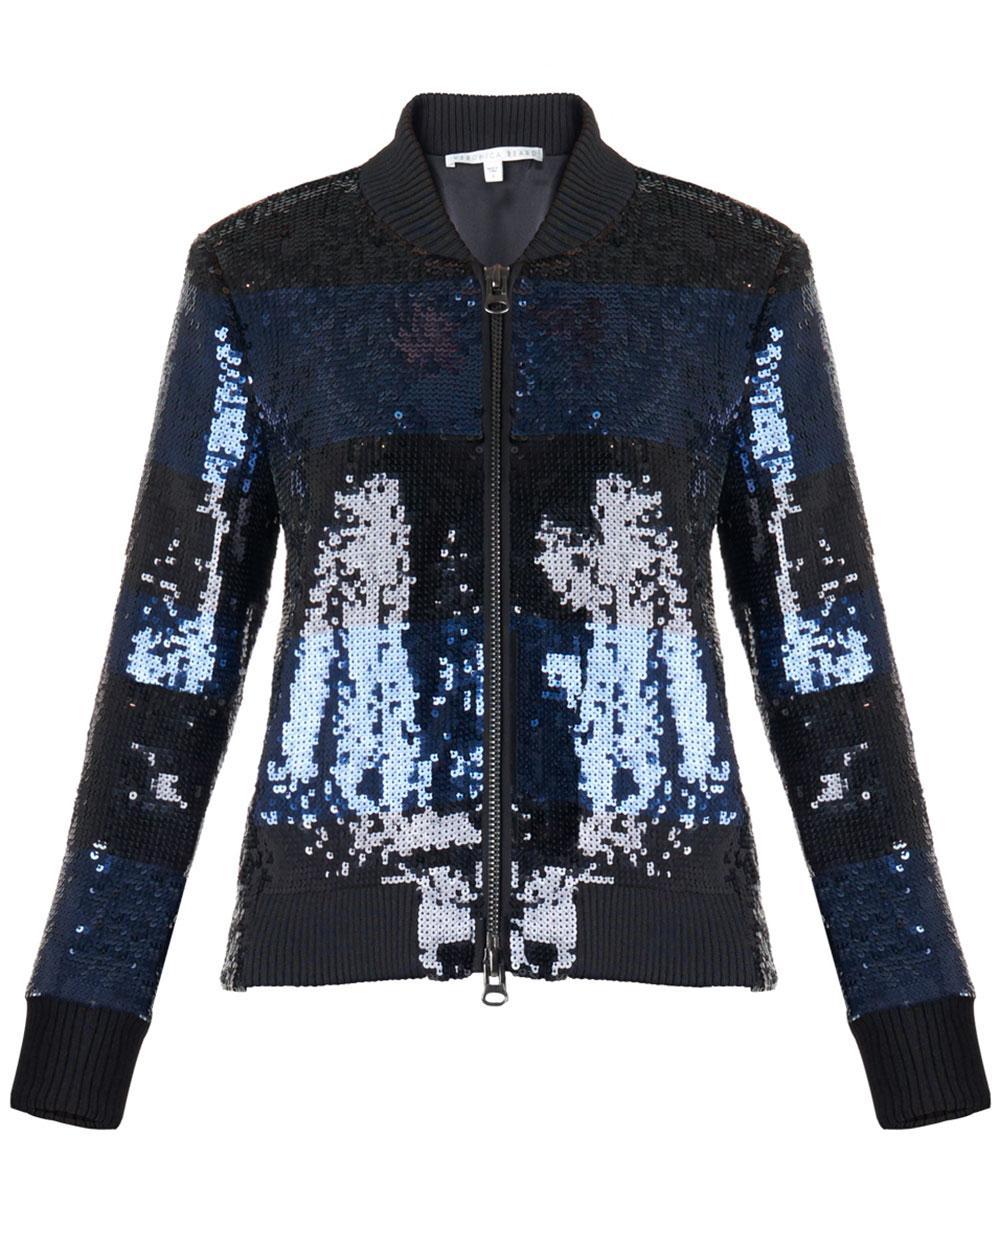 Lyst Veronica Beard Lexington Sequined Bomber Jacket In Blue